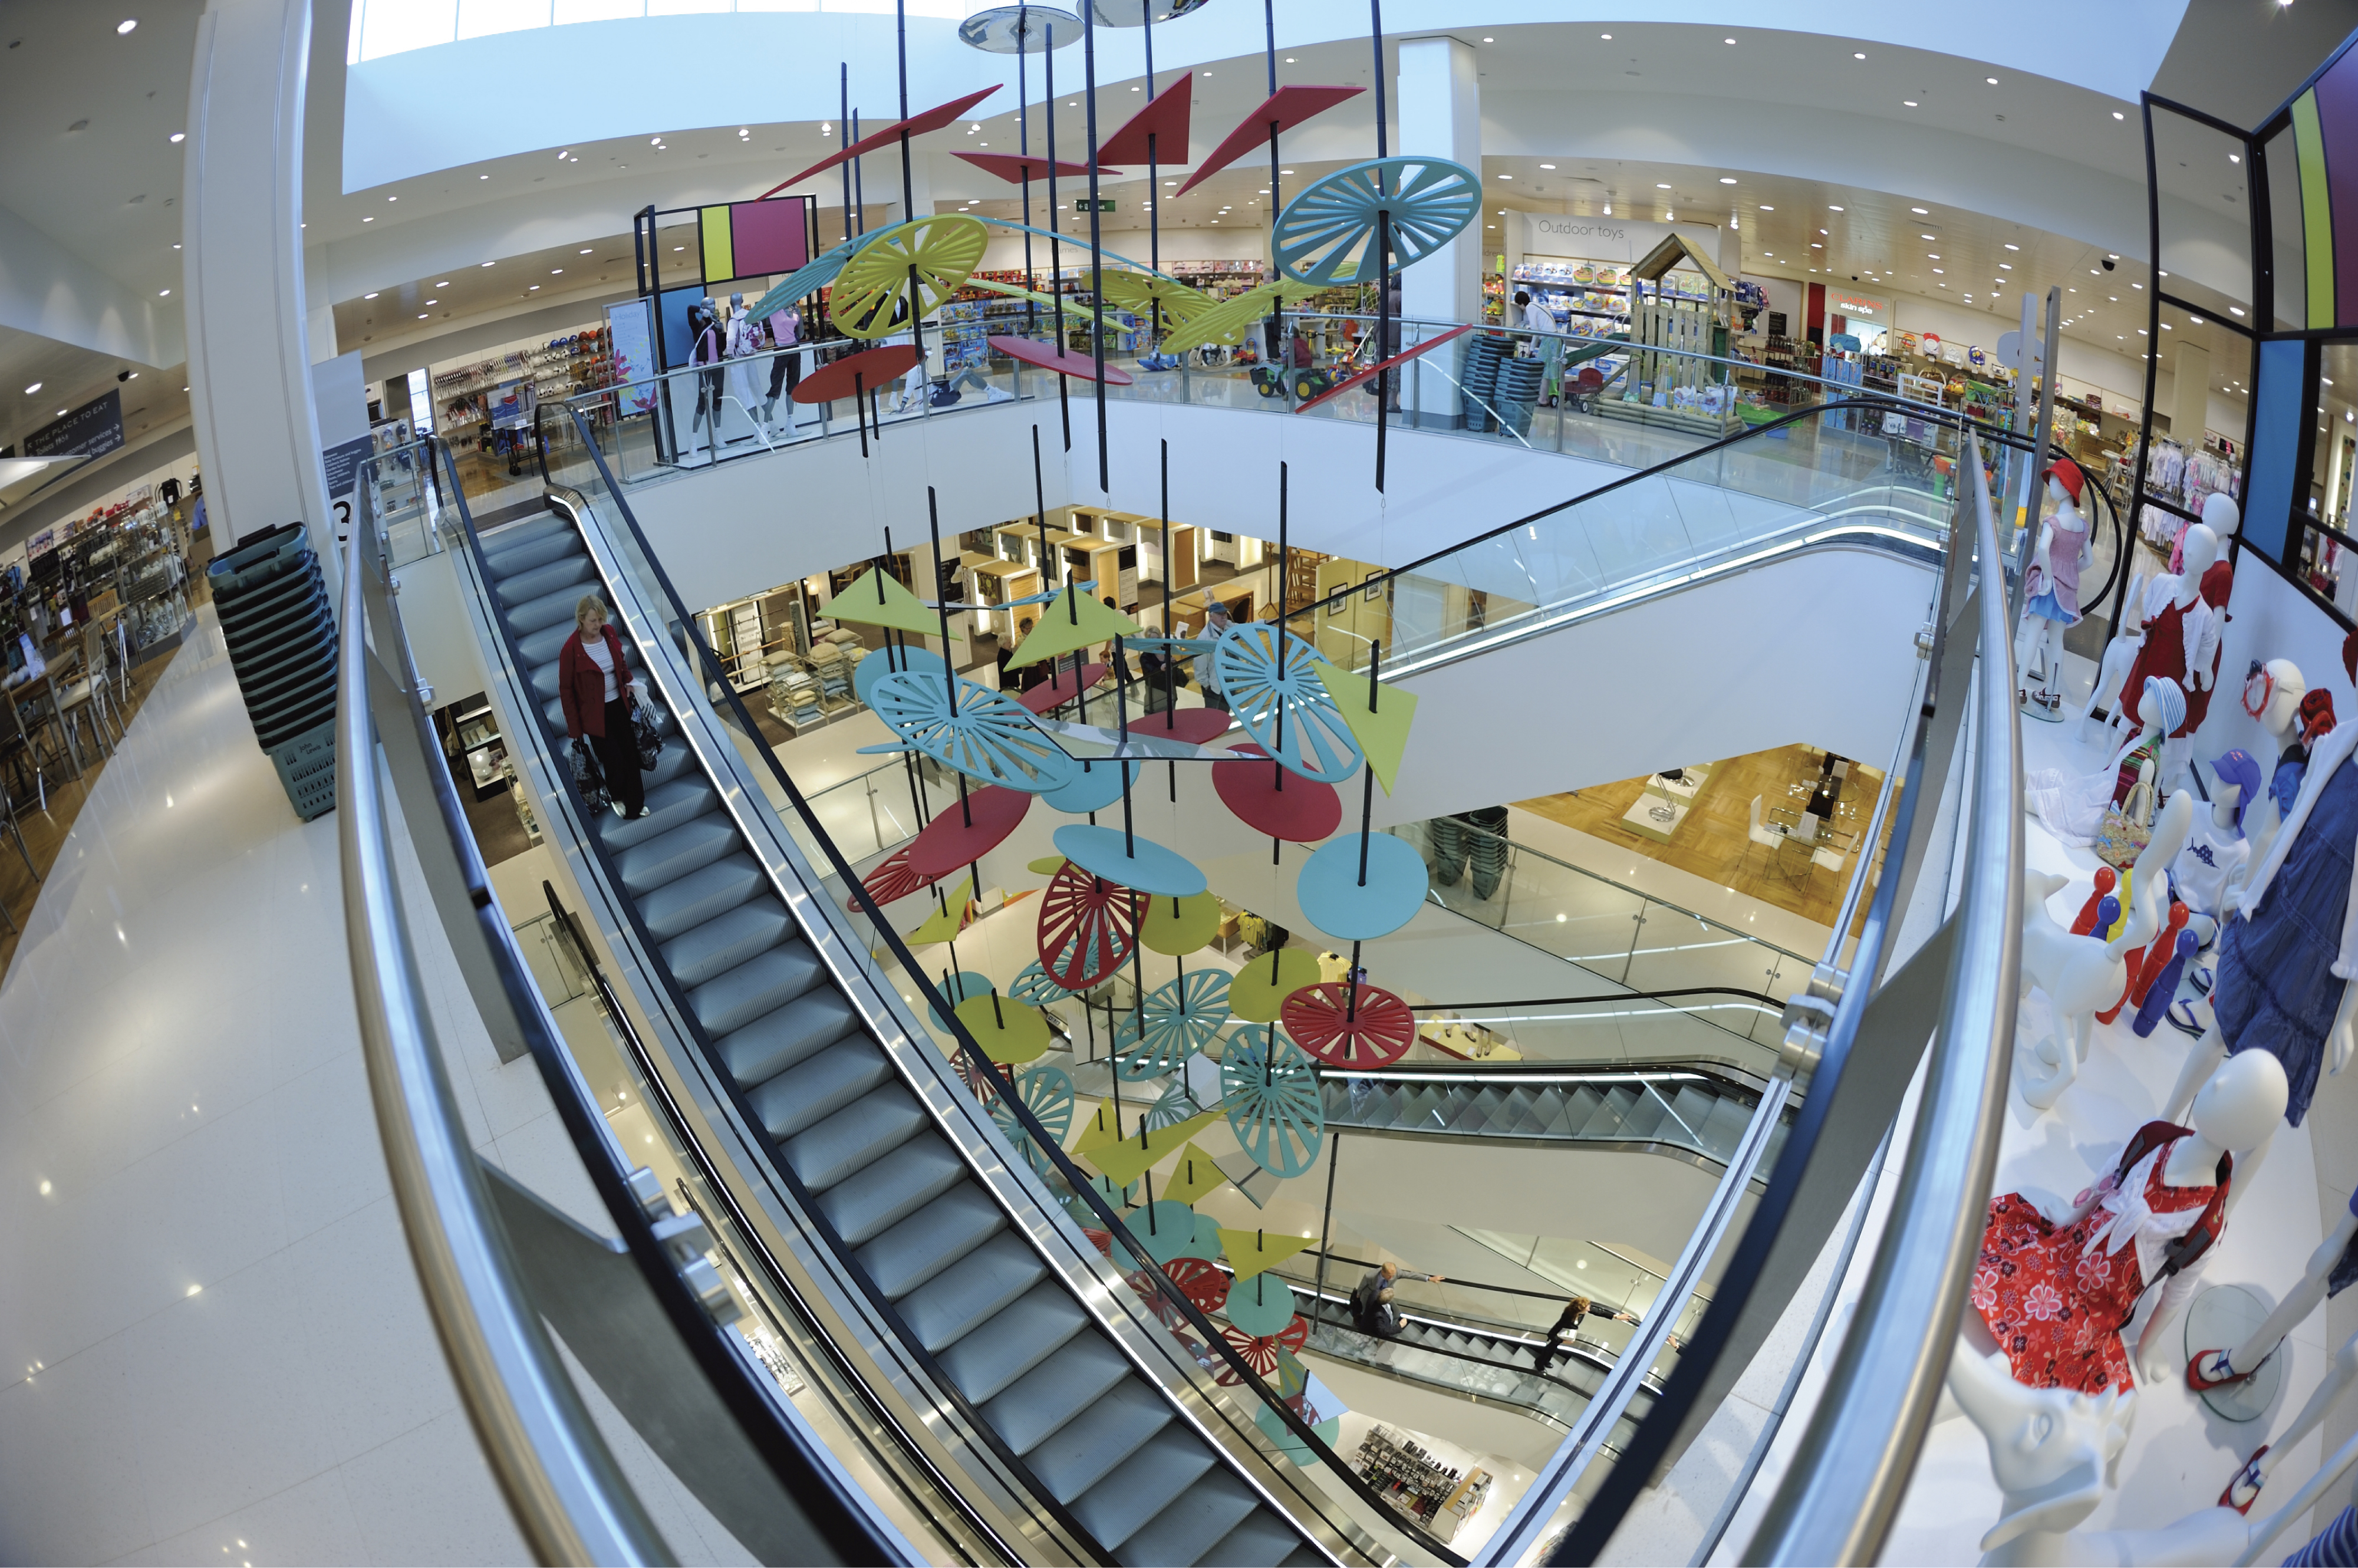 kone escalator photography